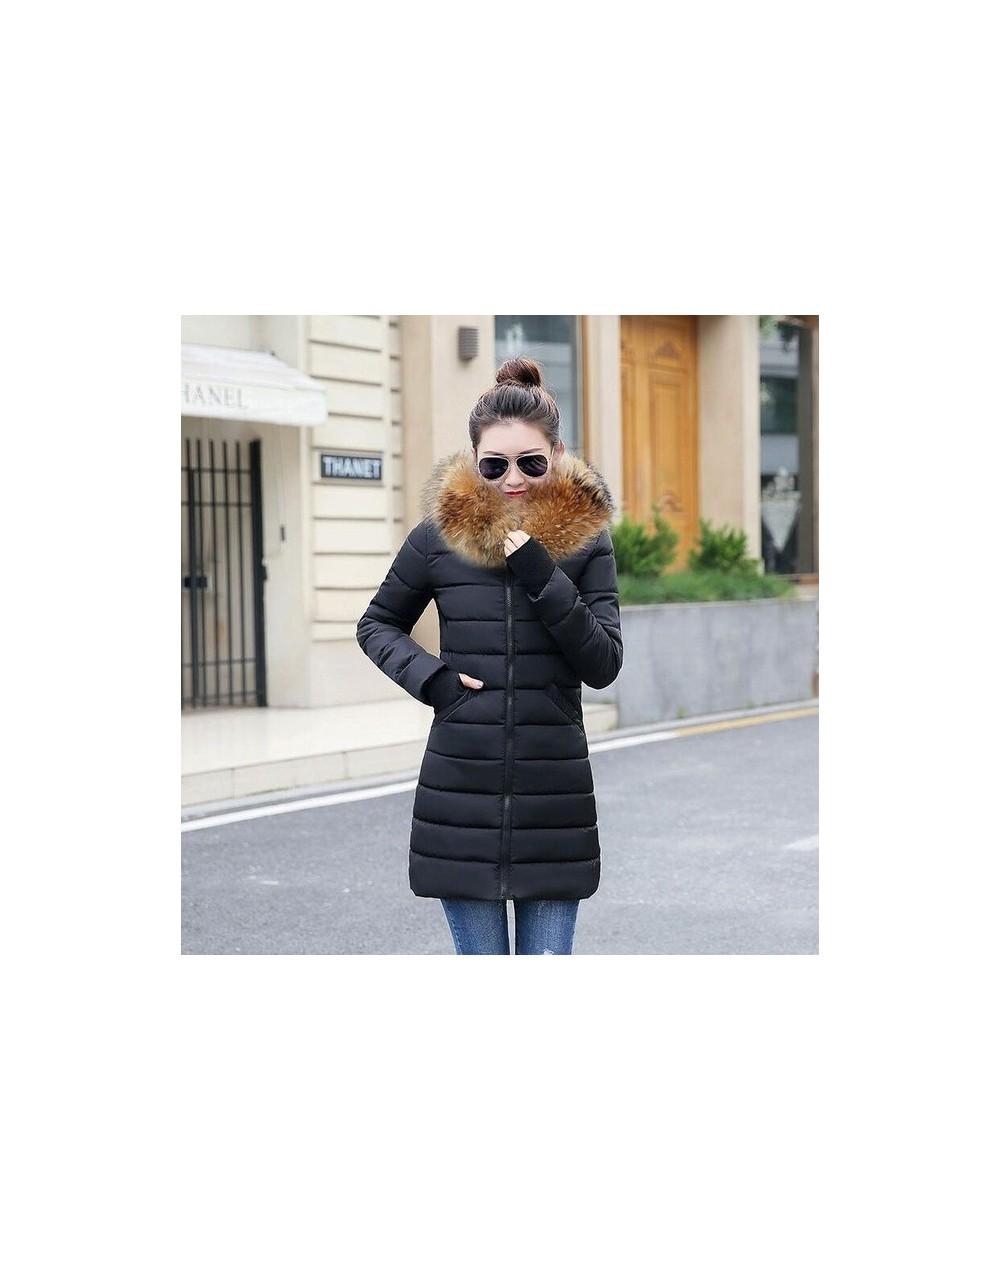 Winter Coat Women 2019 New Fashion Winter Jacket Women Fake Raccoon Fur Collar Women Parkas Warm Down Jacket Female outerwea...